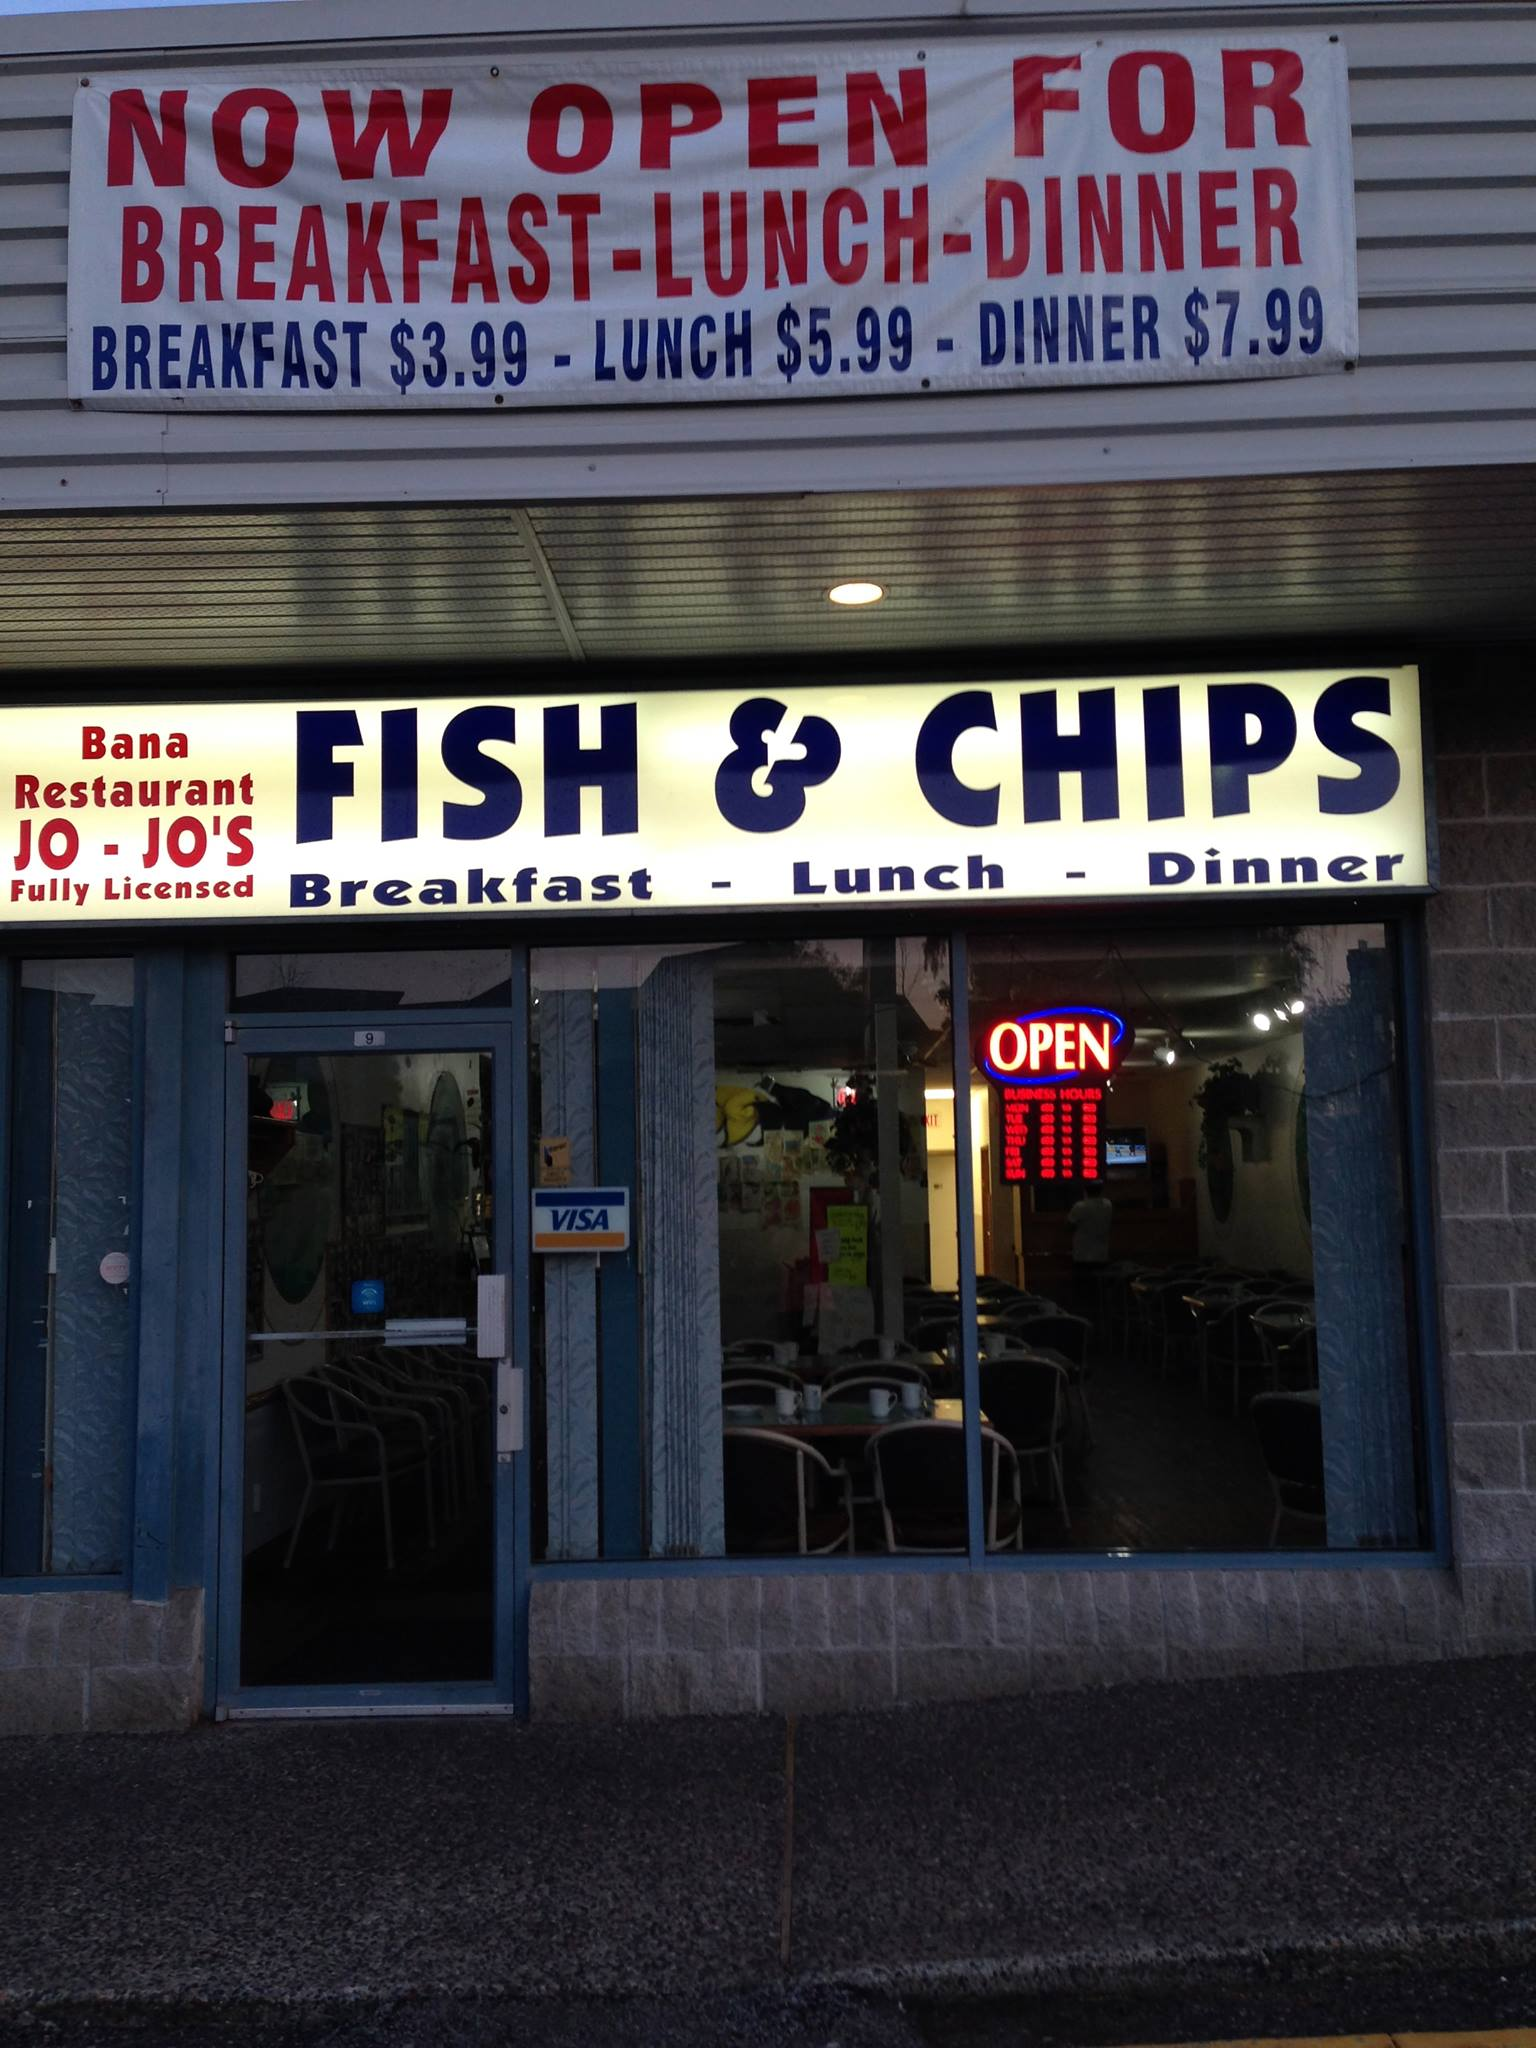 Jojo's Fish & Chips Bana Restaurant logo